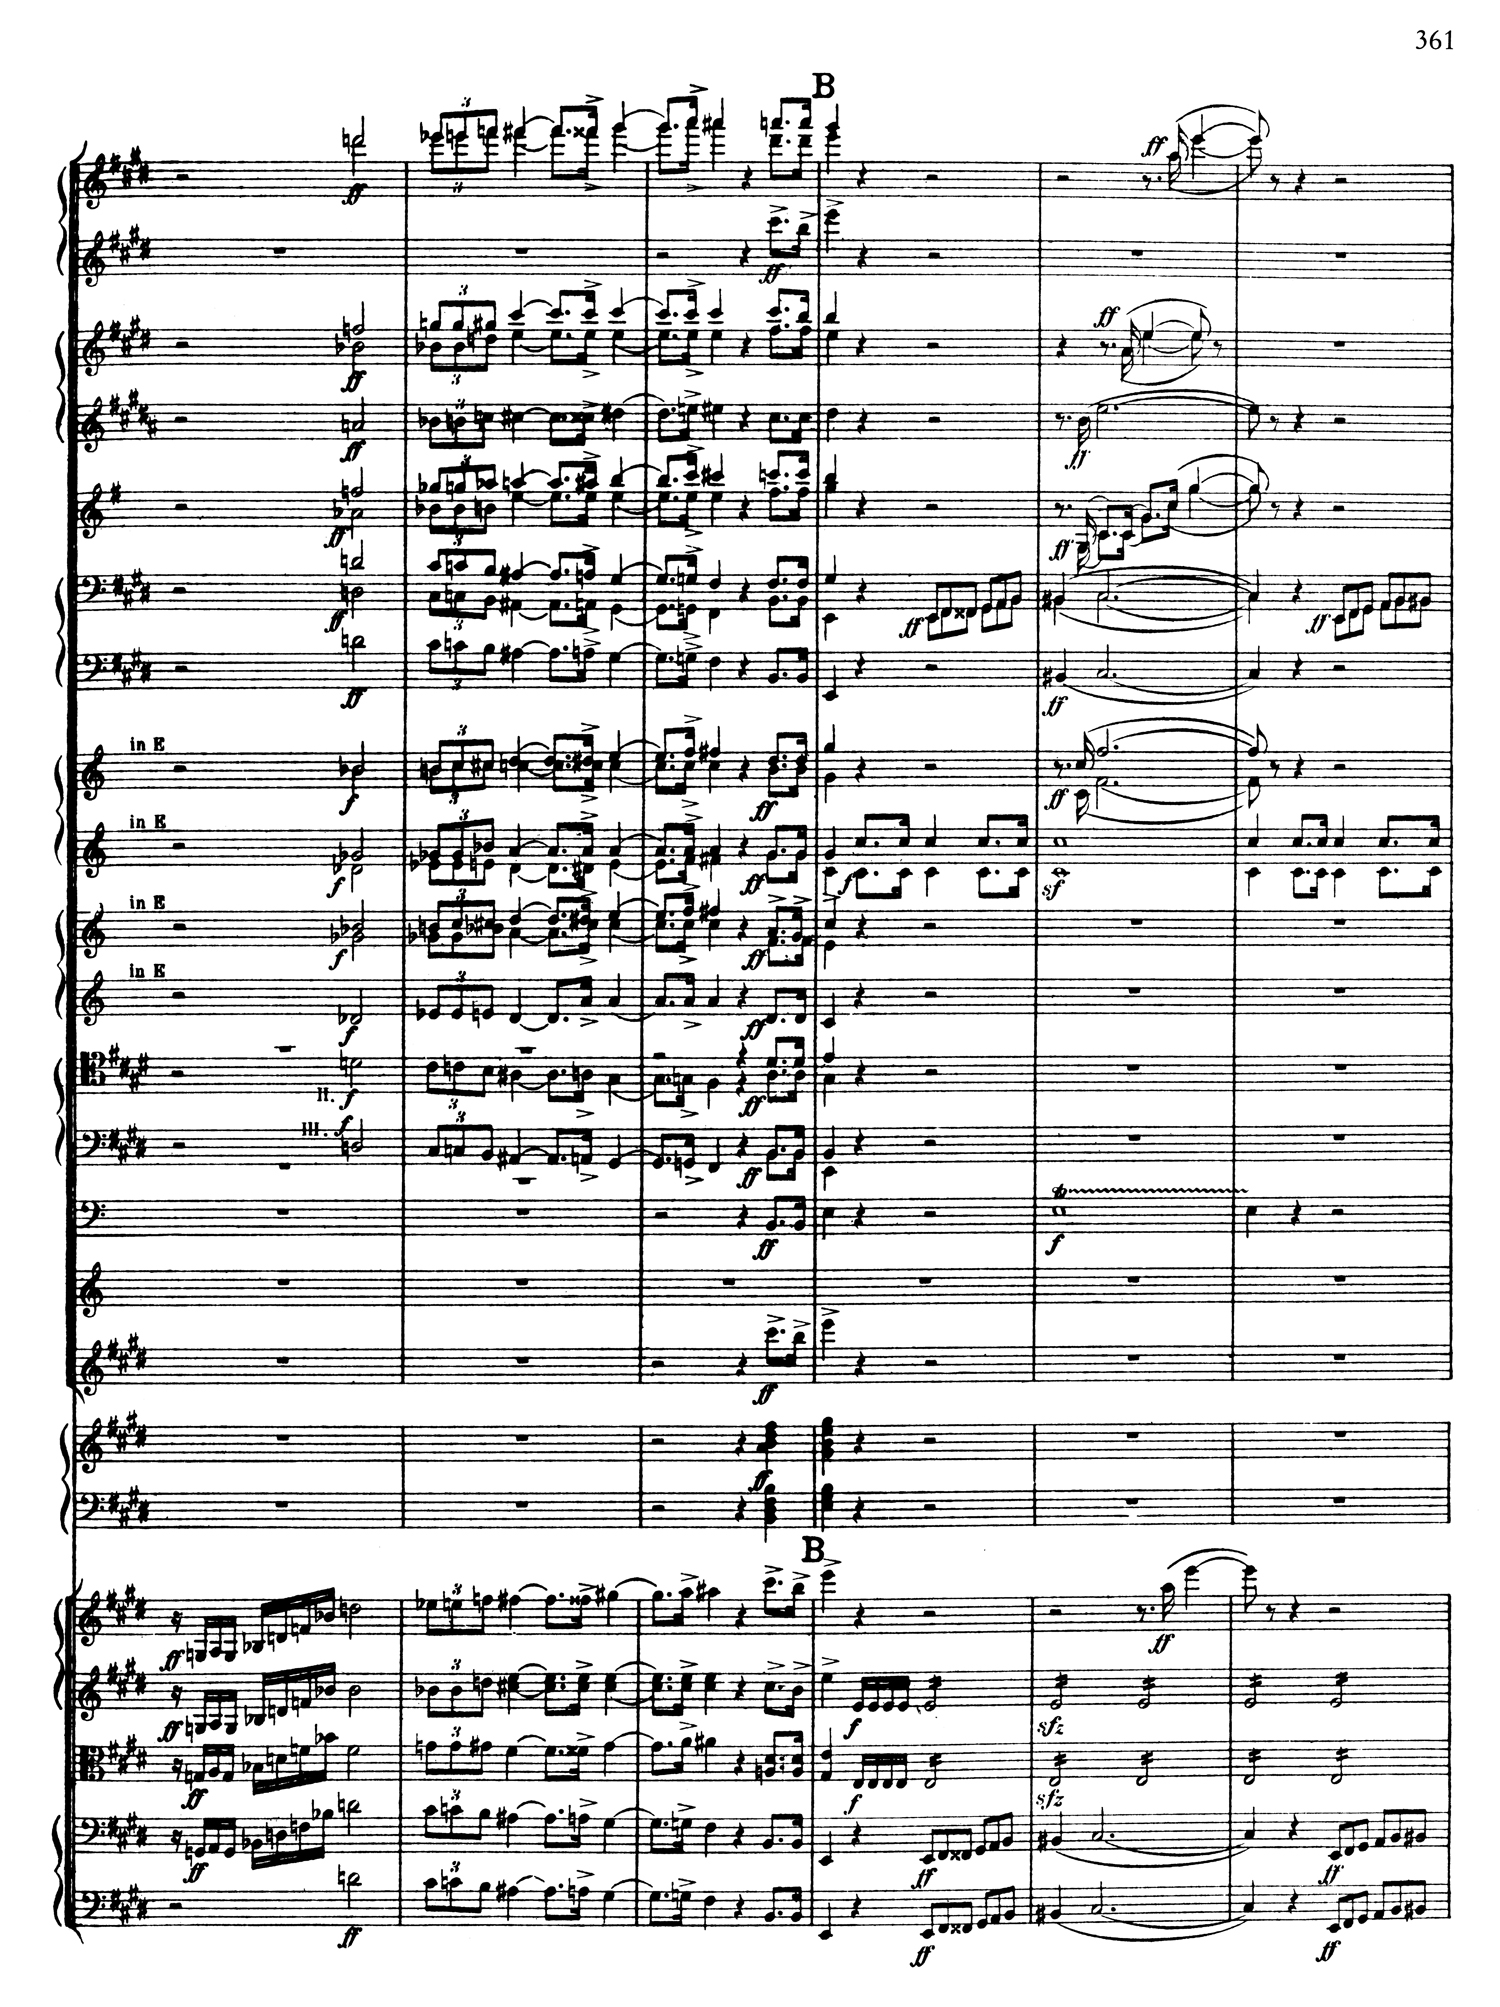 Strauss Don Juan Score 4.jpg